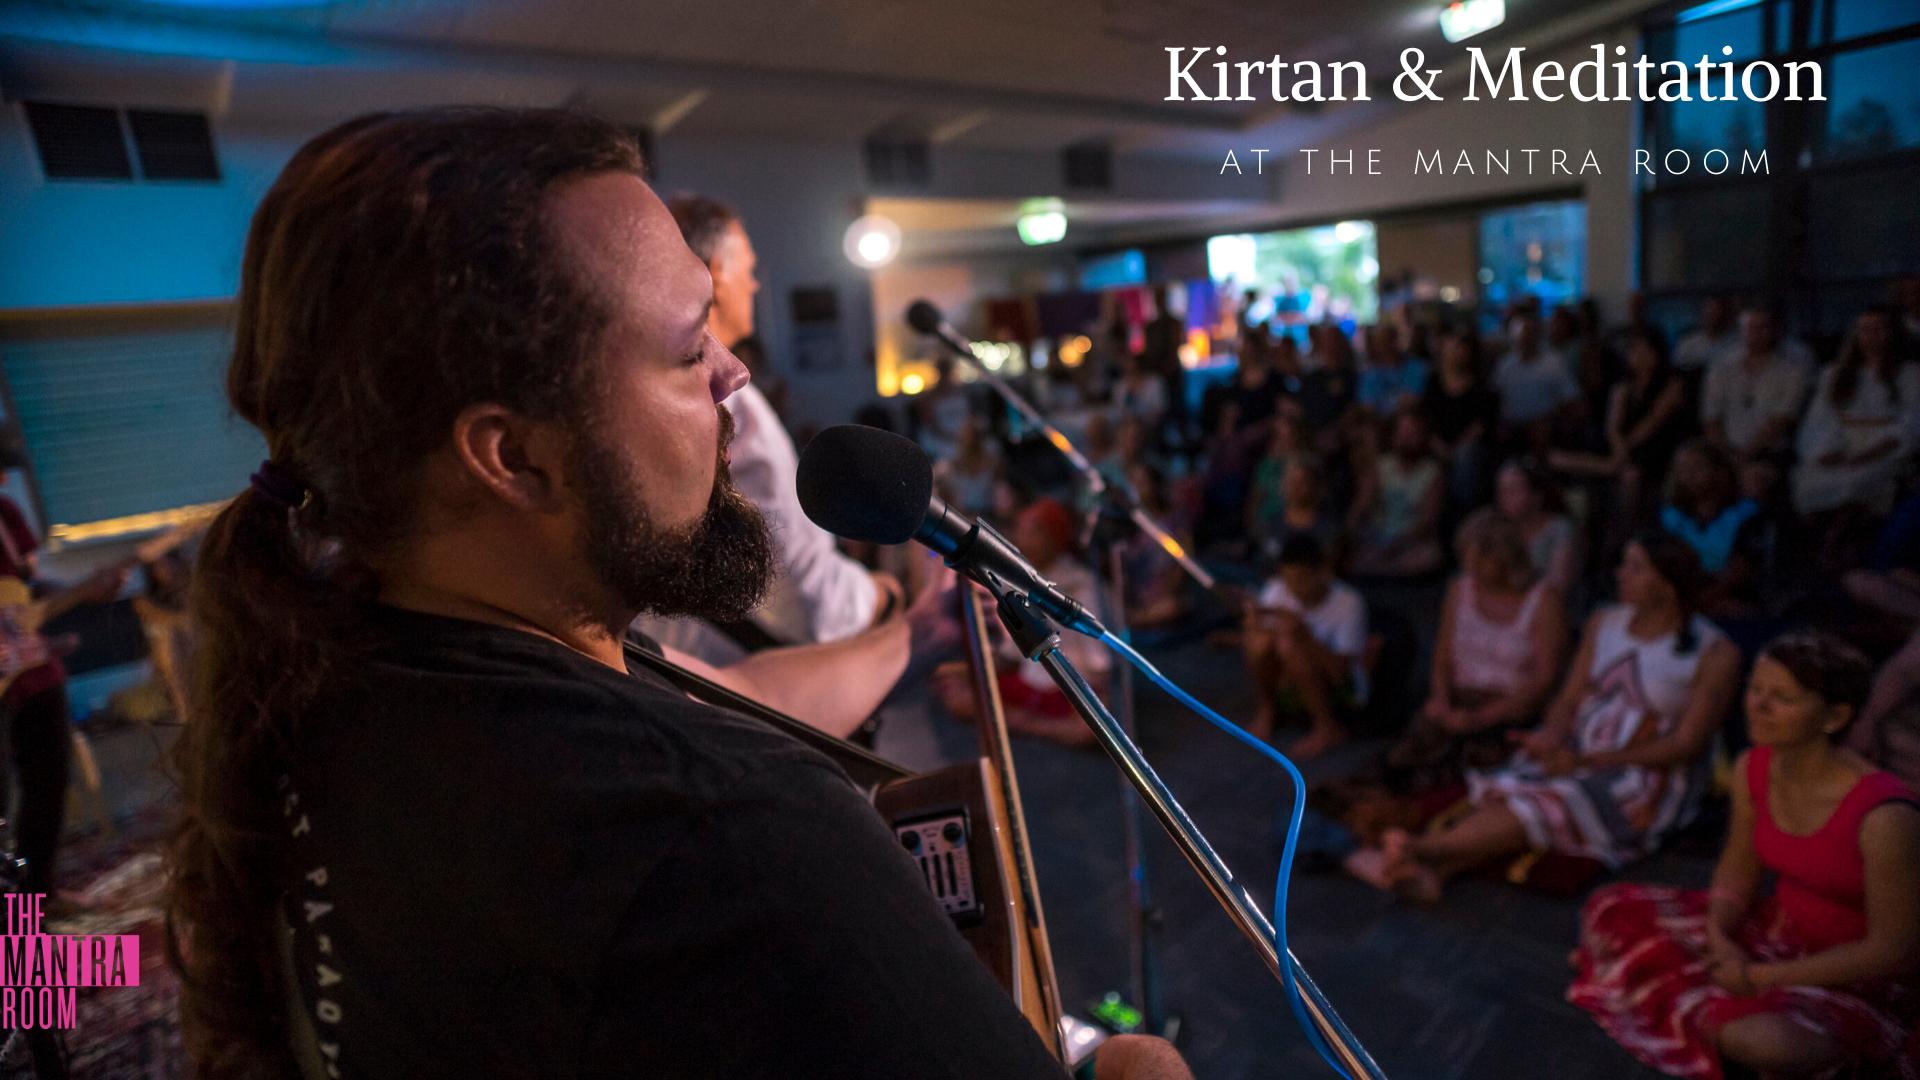 Kirtan & Meditation at The Mantra Room